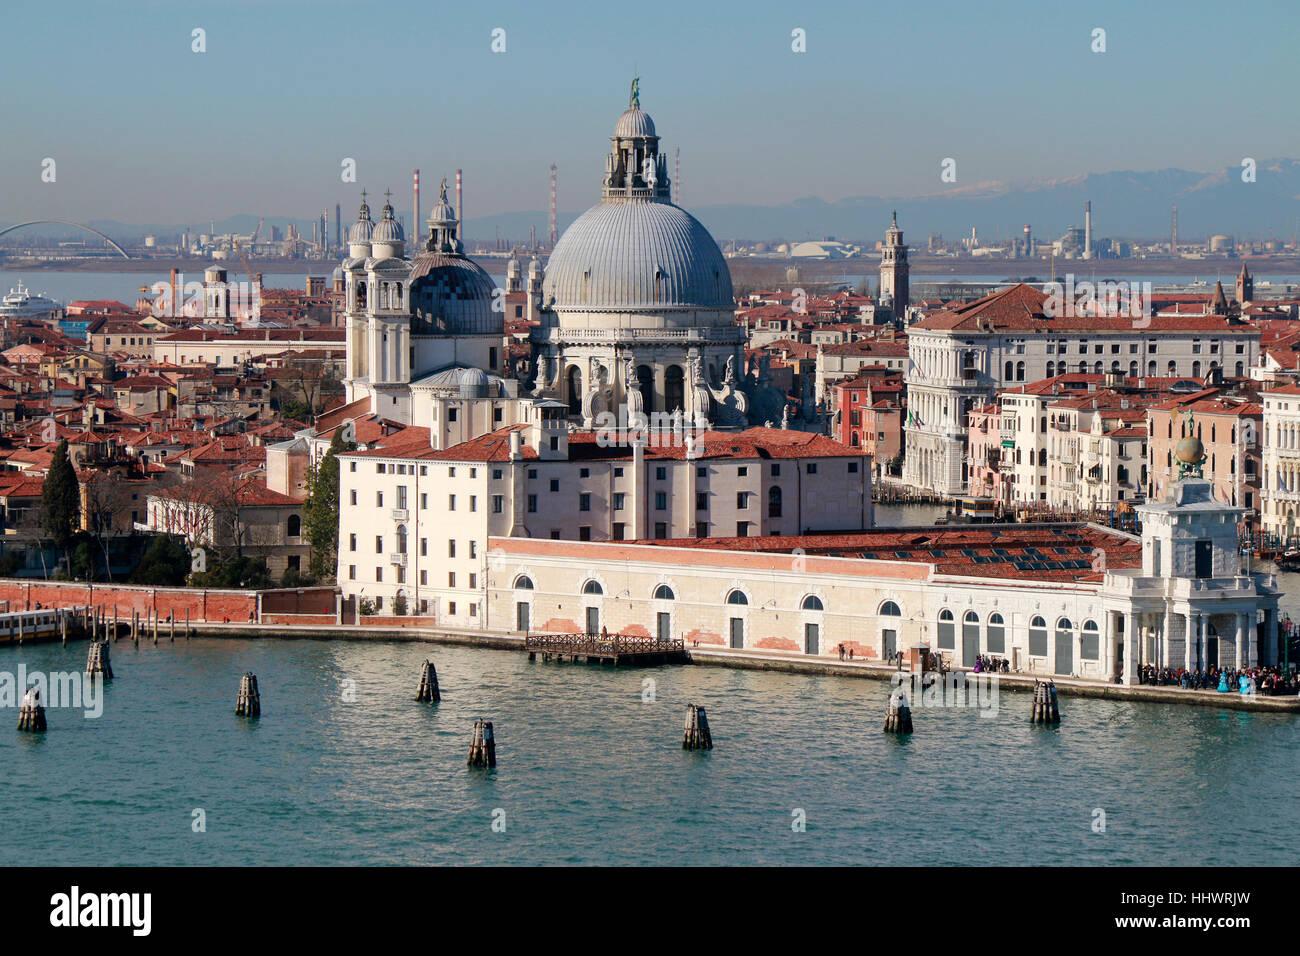 Luftbild, Venedig, Italien. - Stock Image